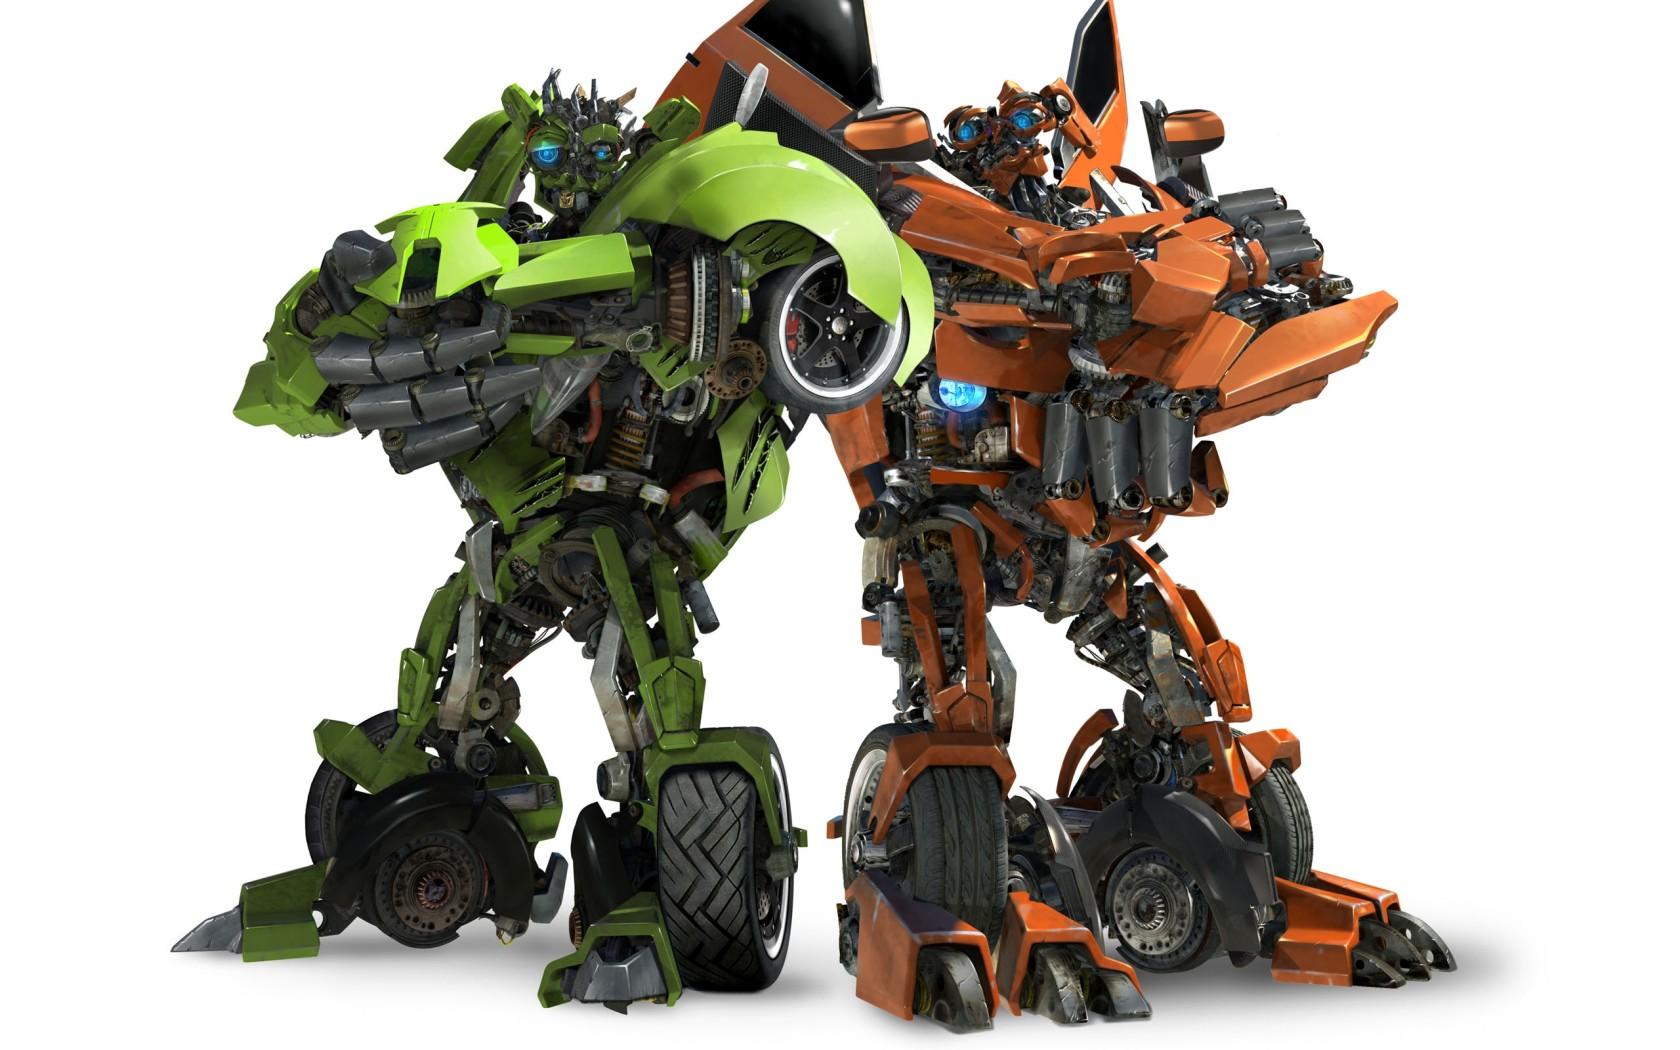 http://www.zastavki.com/pictures/1680x1050/2009/3D-graphics_Transformers_016738_.jpg